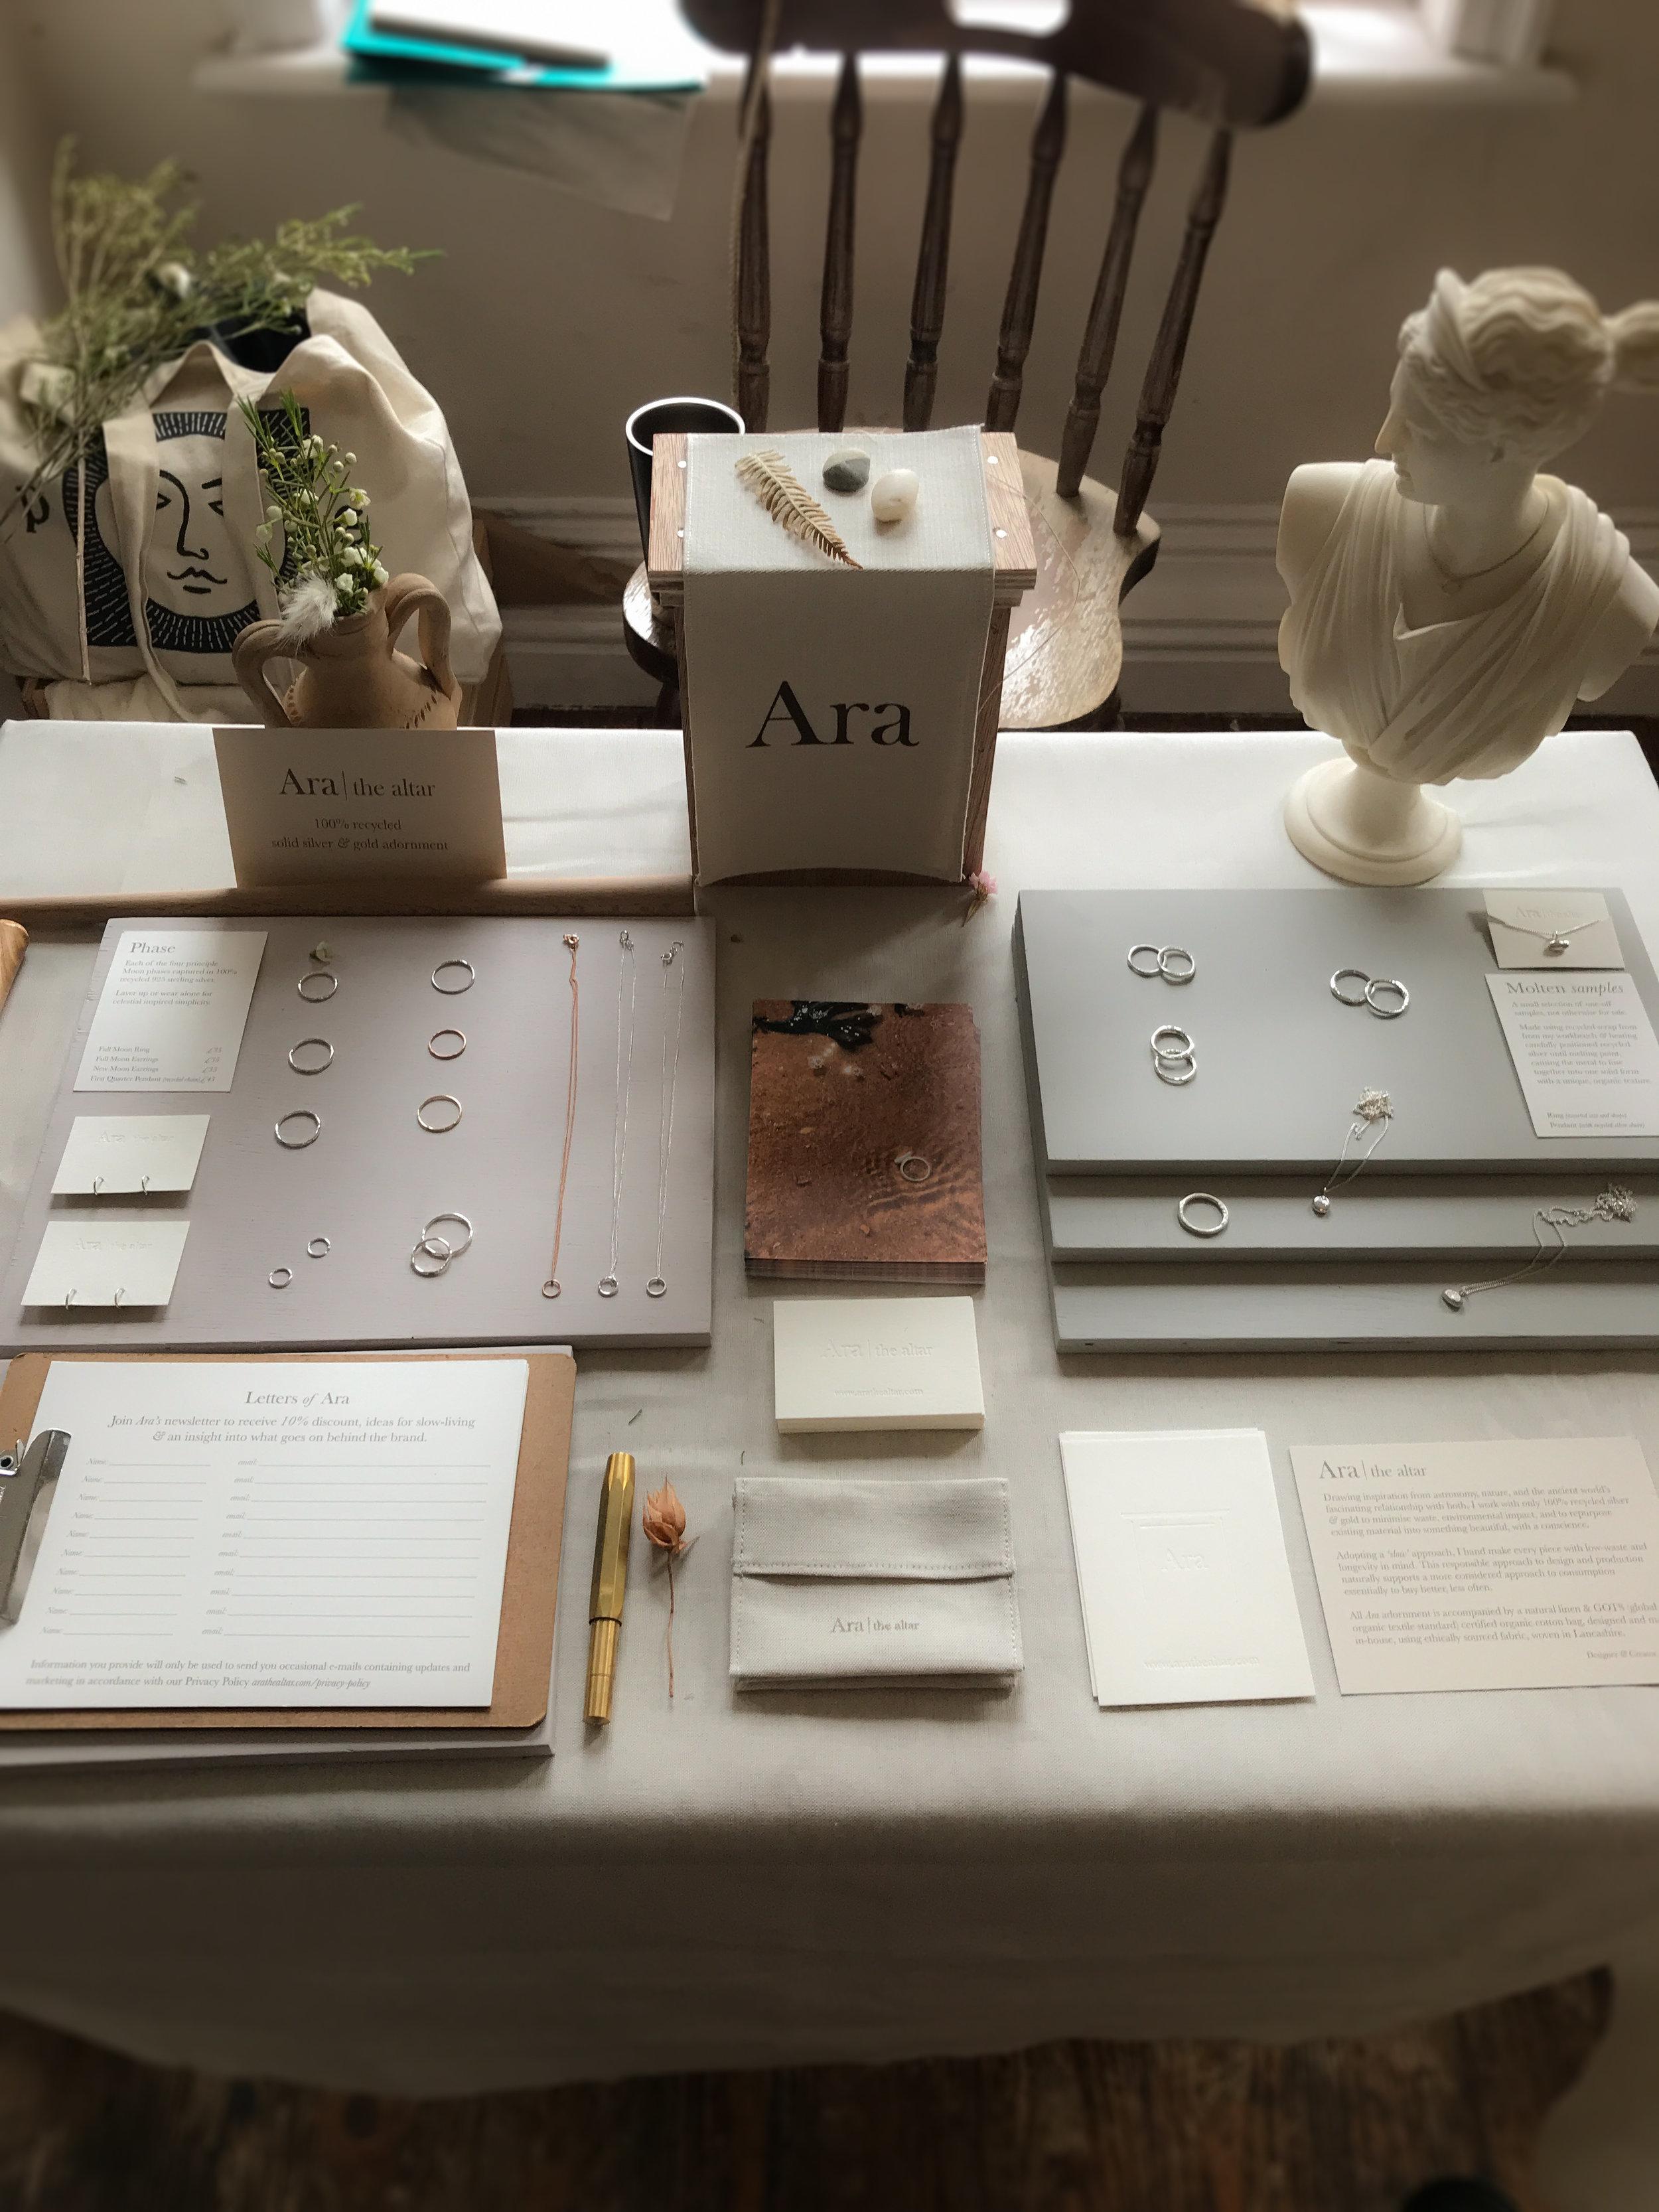 Ara the altar - a lammas gathering - set up